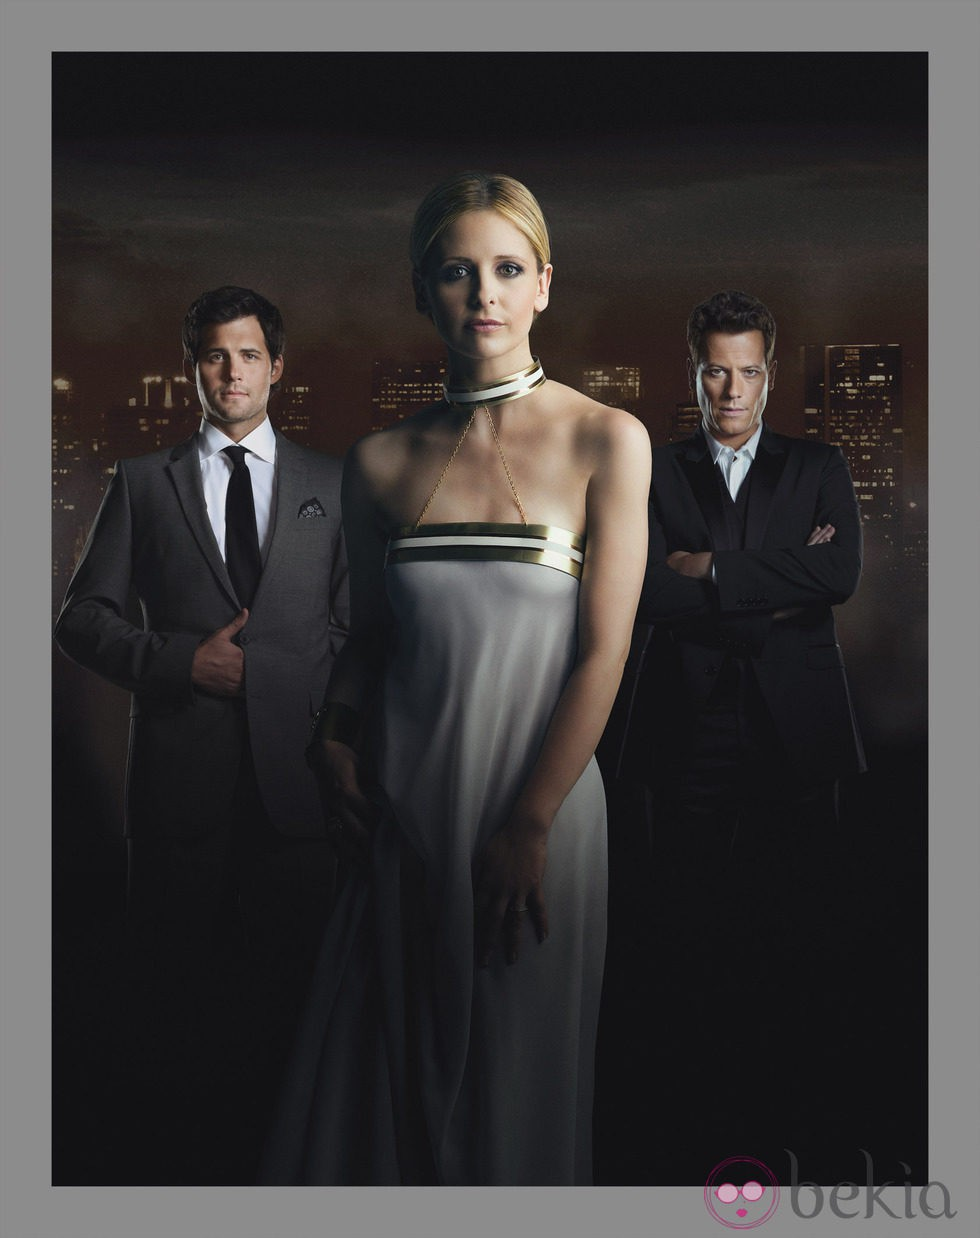 Sarah Michelle Gellar protagoniza el drama 'Ringer'